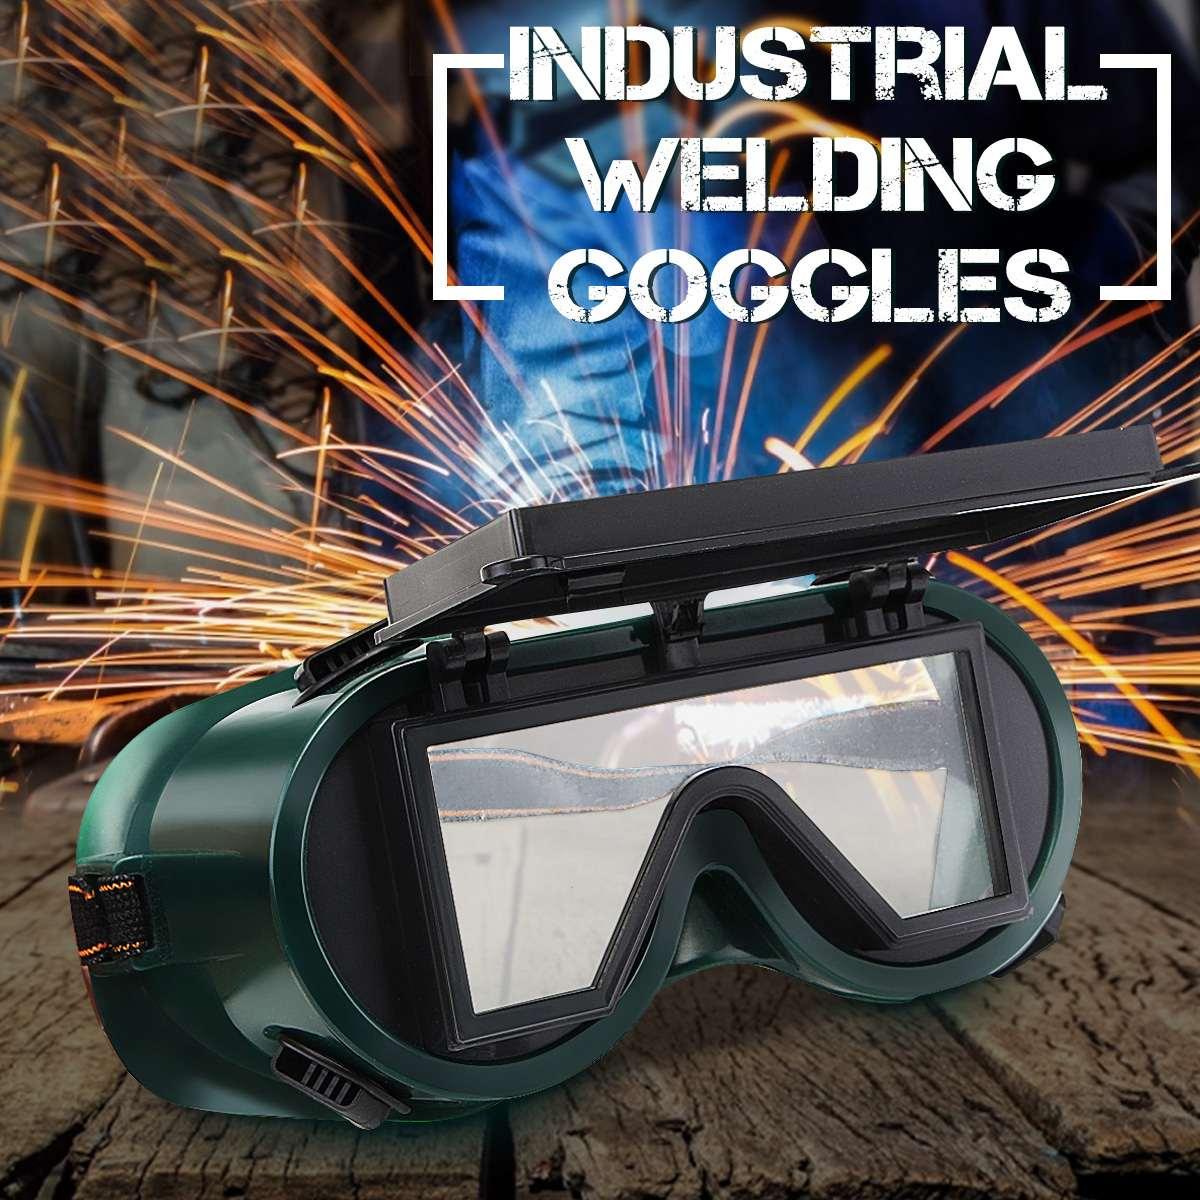 Auto Darkening LCD Welding Glasses Solar Goggles Mask Helmet EyeE Protection Cap